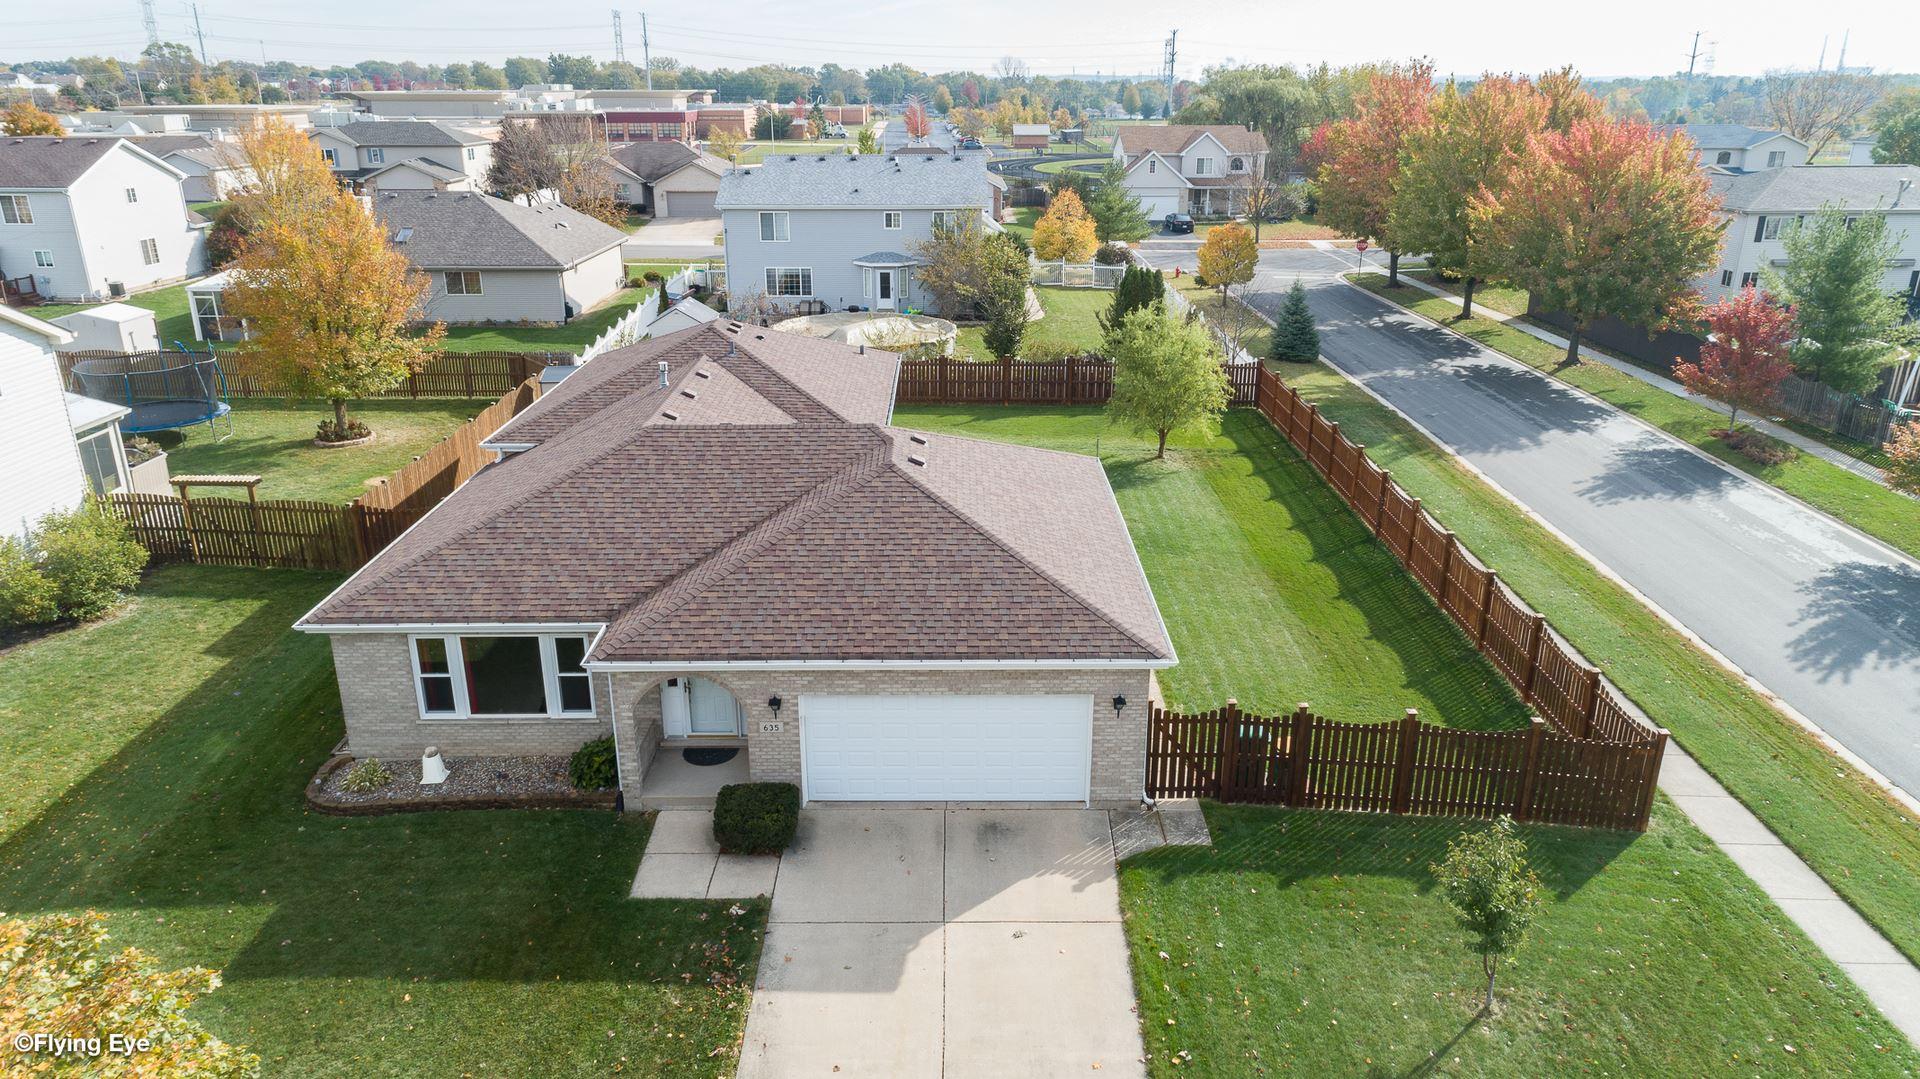 Photo of 635 Huron Drive, Romeoville, IL 60446 (MLS # 10912083)